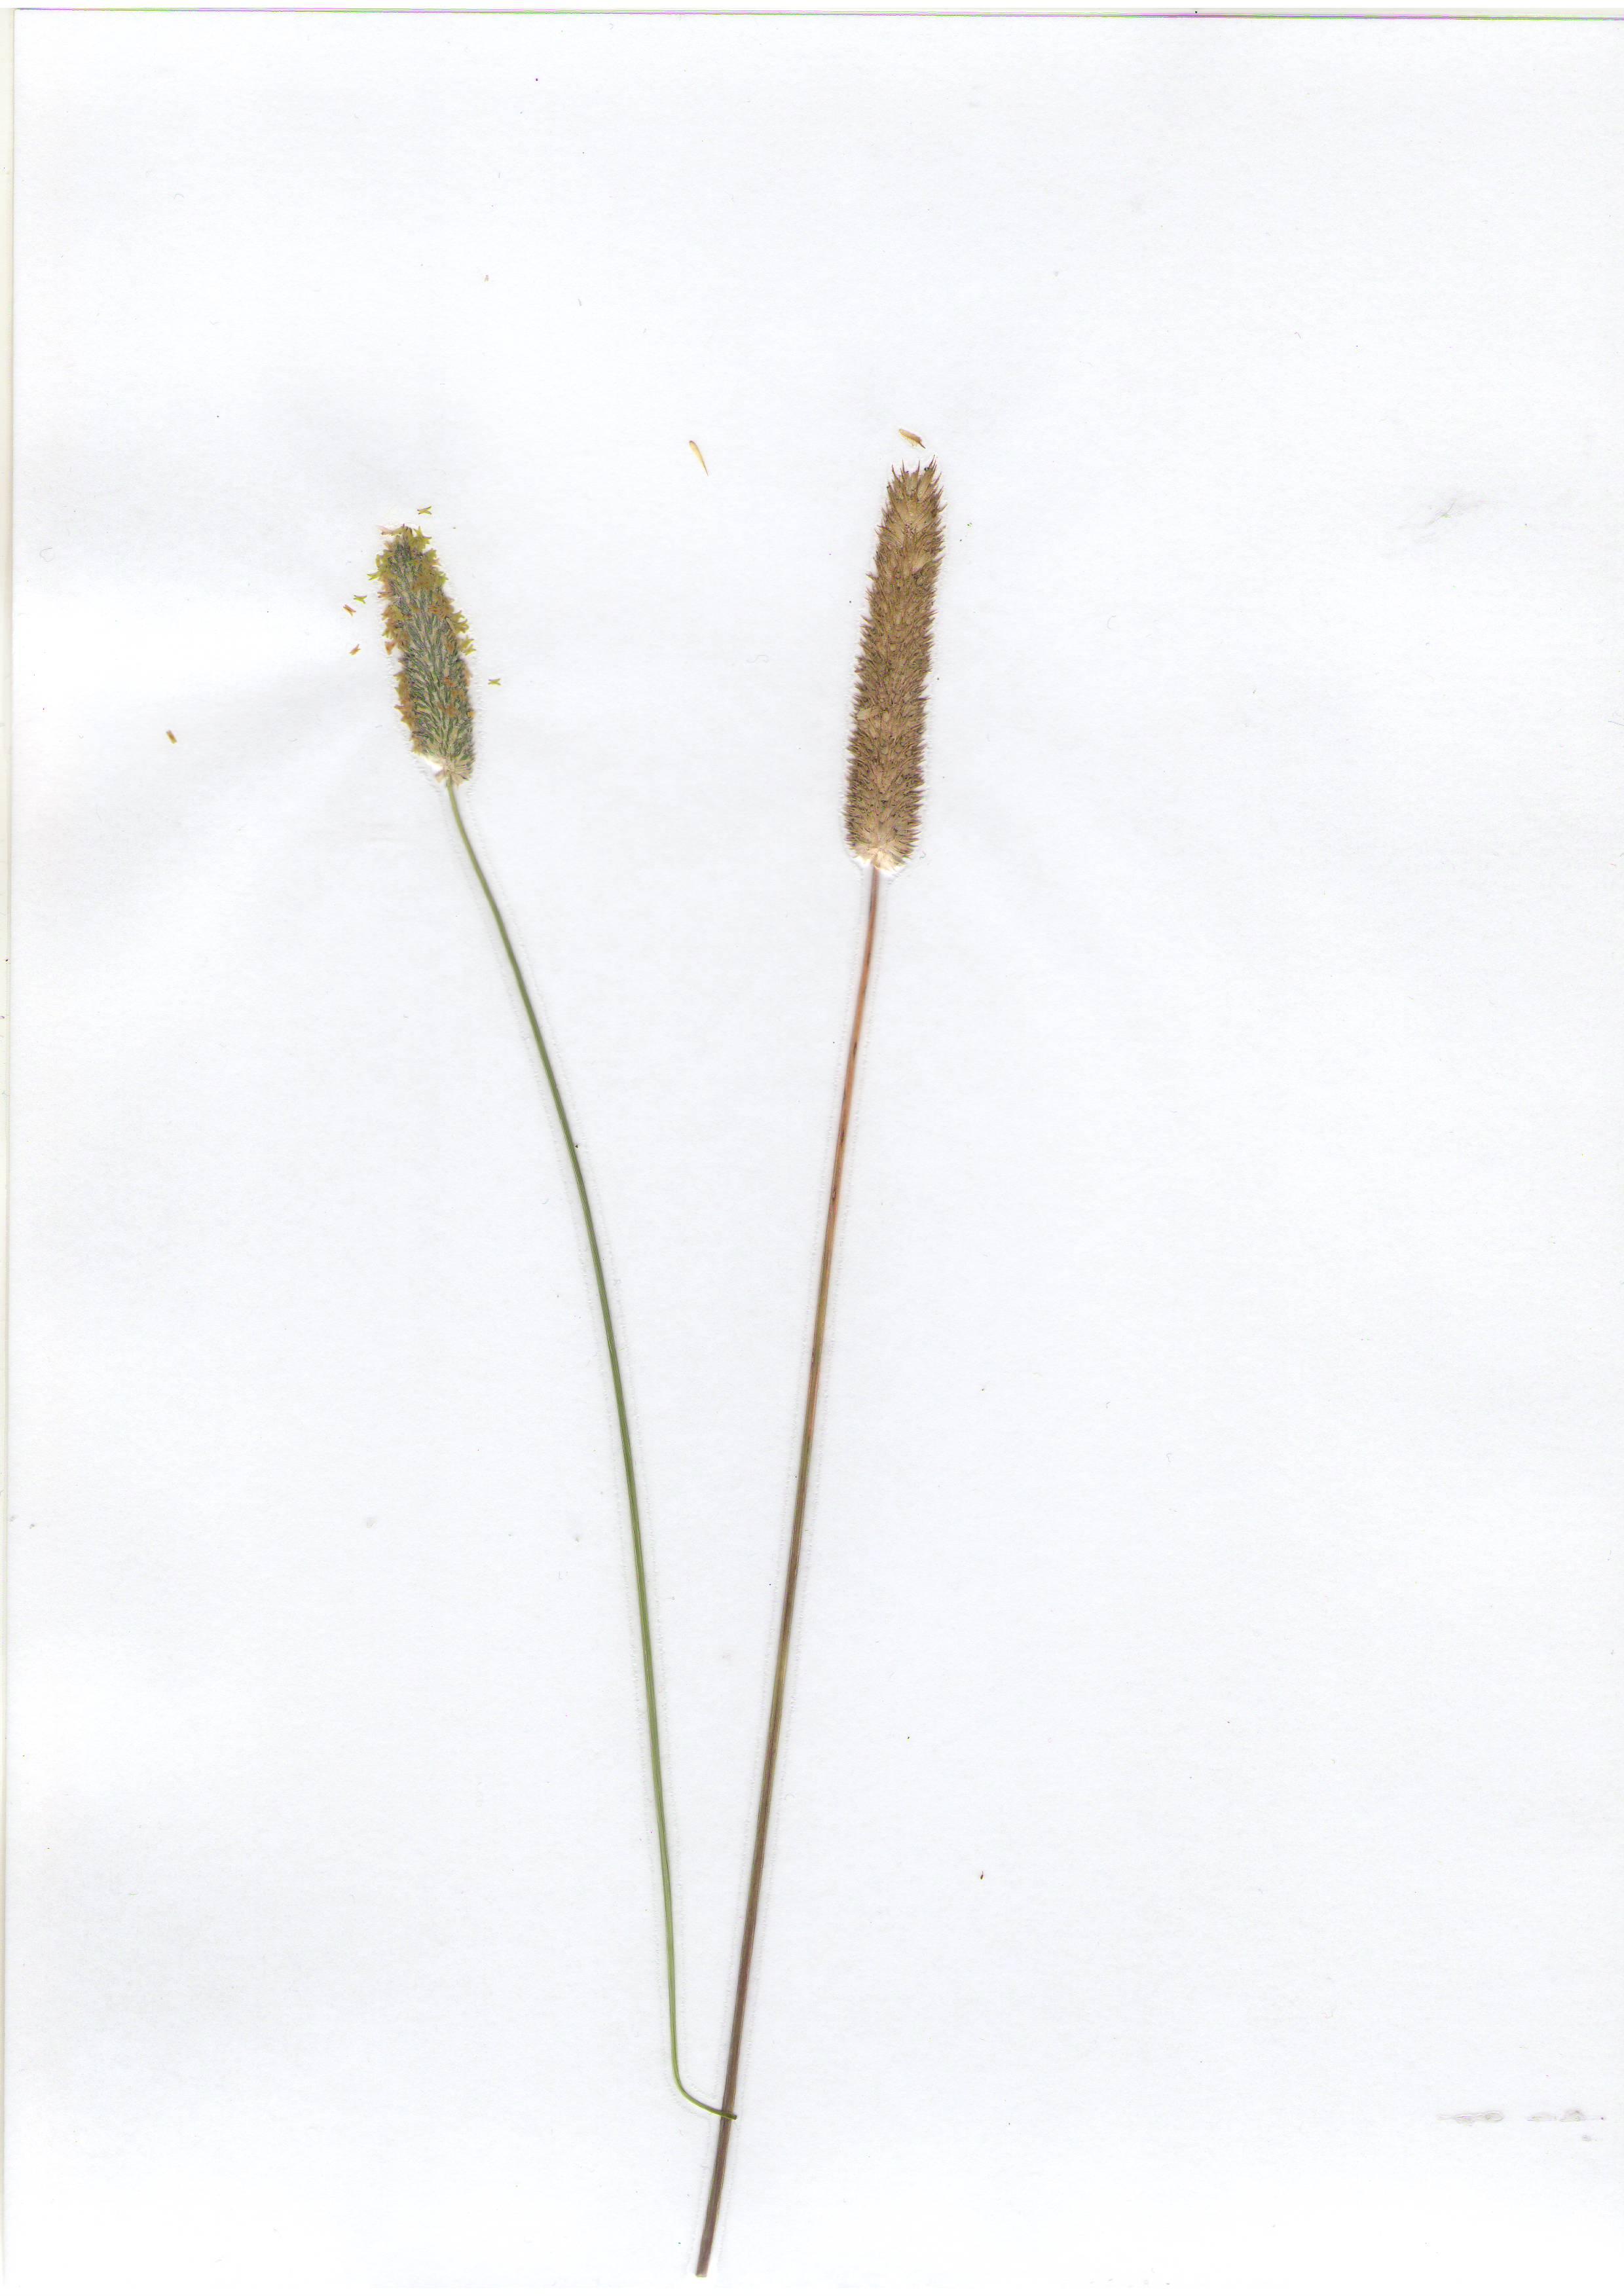 Тимо�еевка л�гова� Phleum pratense